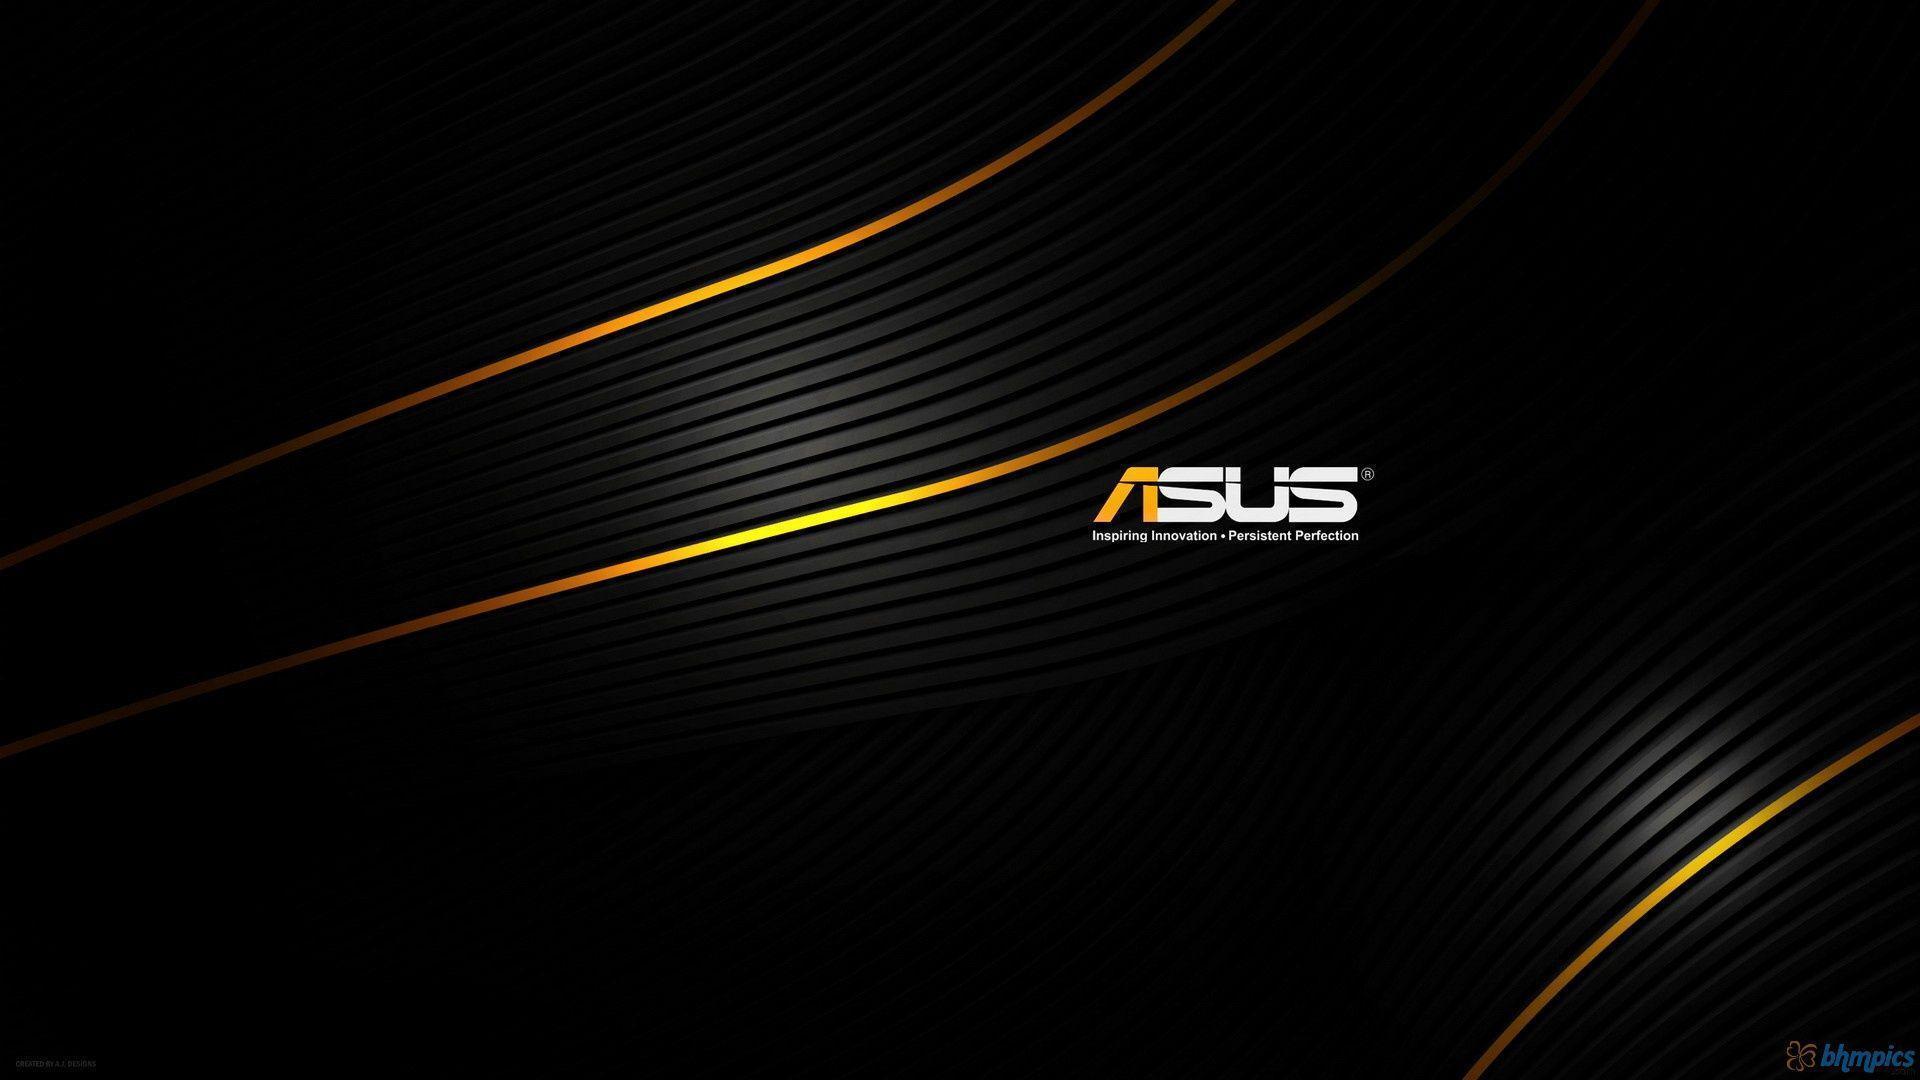 Asus VivoBook Wallpapers Top Free Asus VivoBook